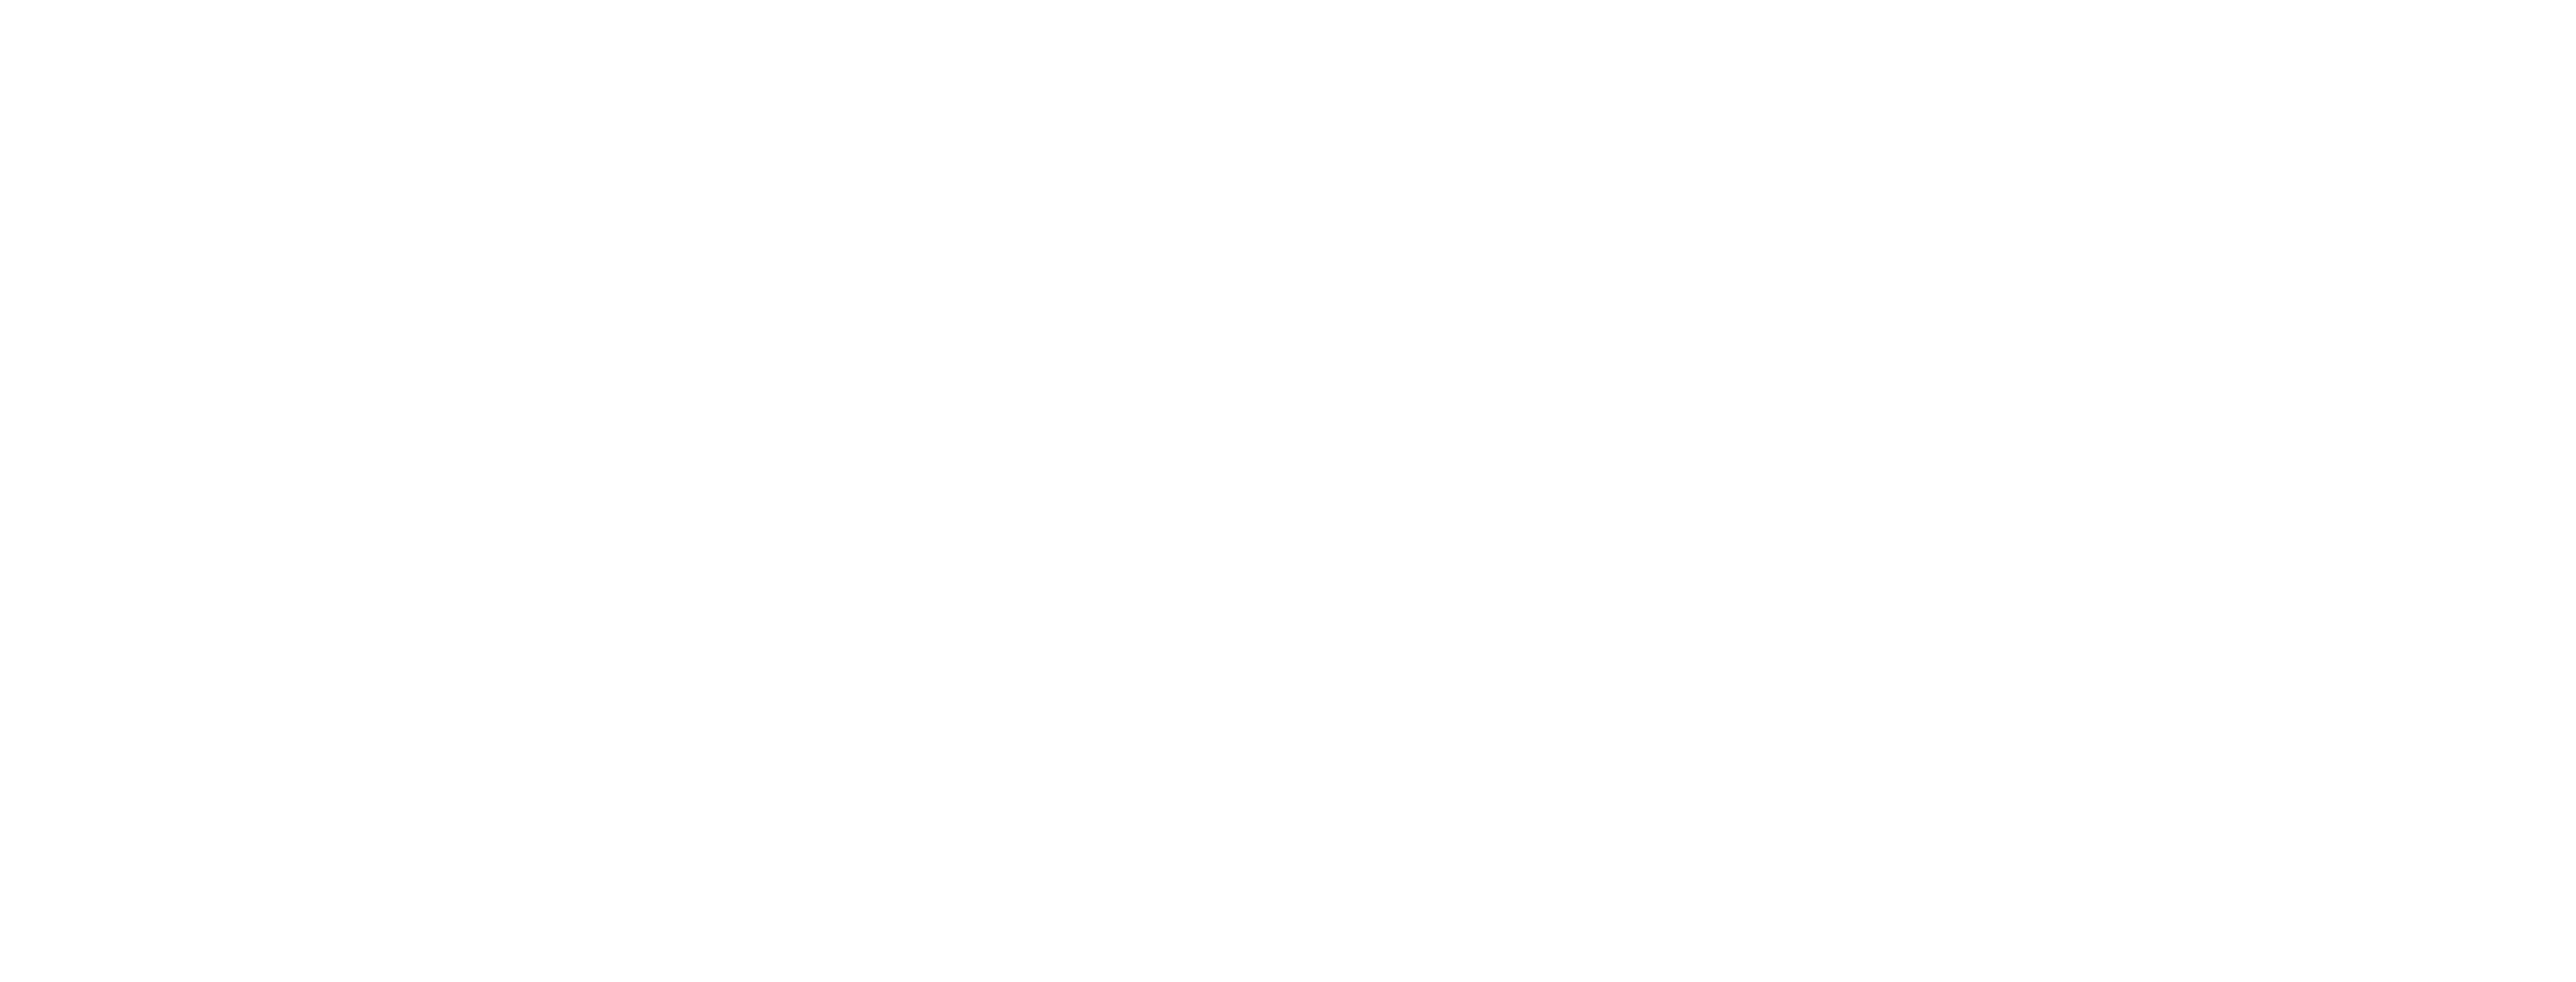 Variant – Commercial Trailer – 20P215 (388x151x120 cm)